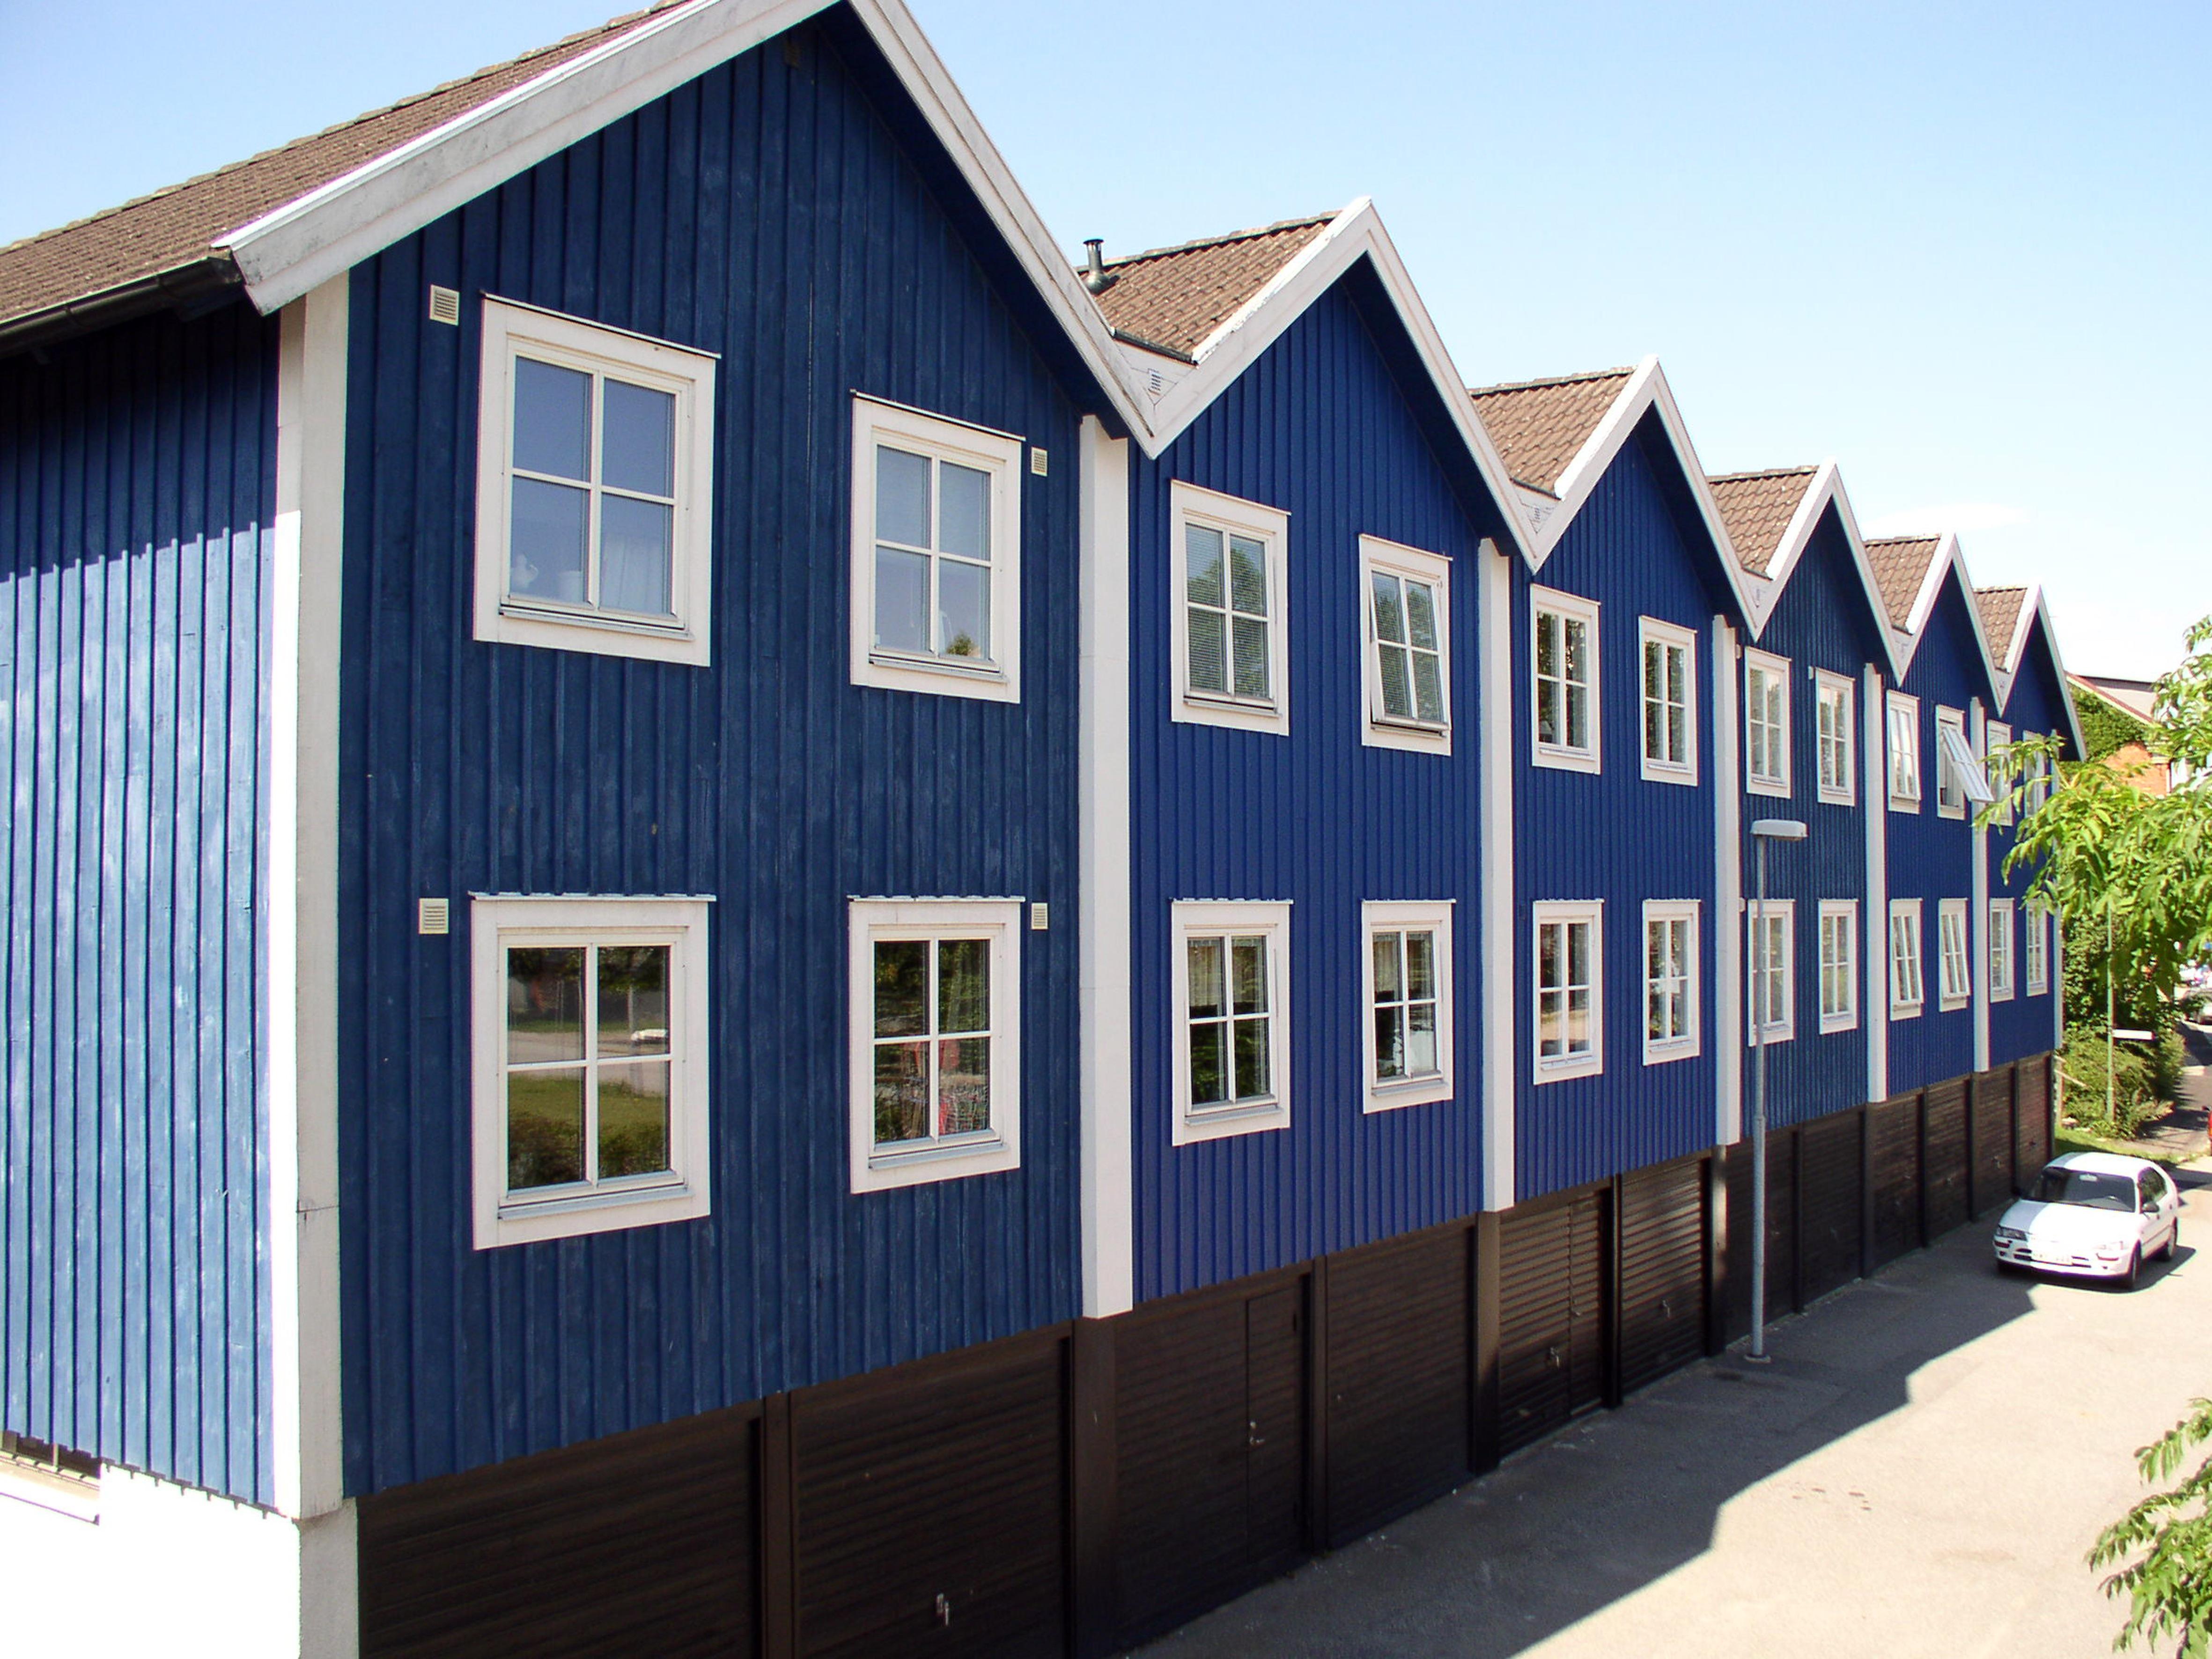 Fotos gratis : arquitectura, madera, blanco, casa, edificio ...